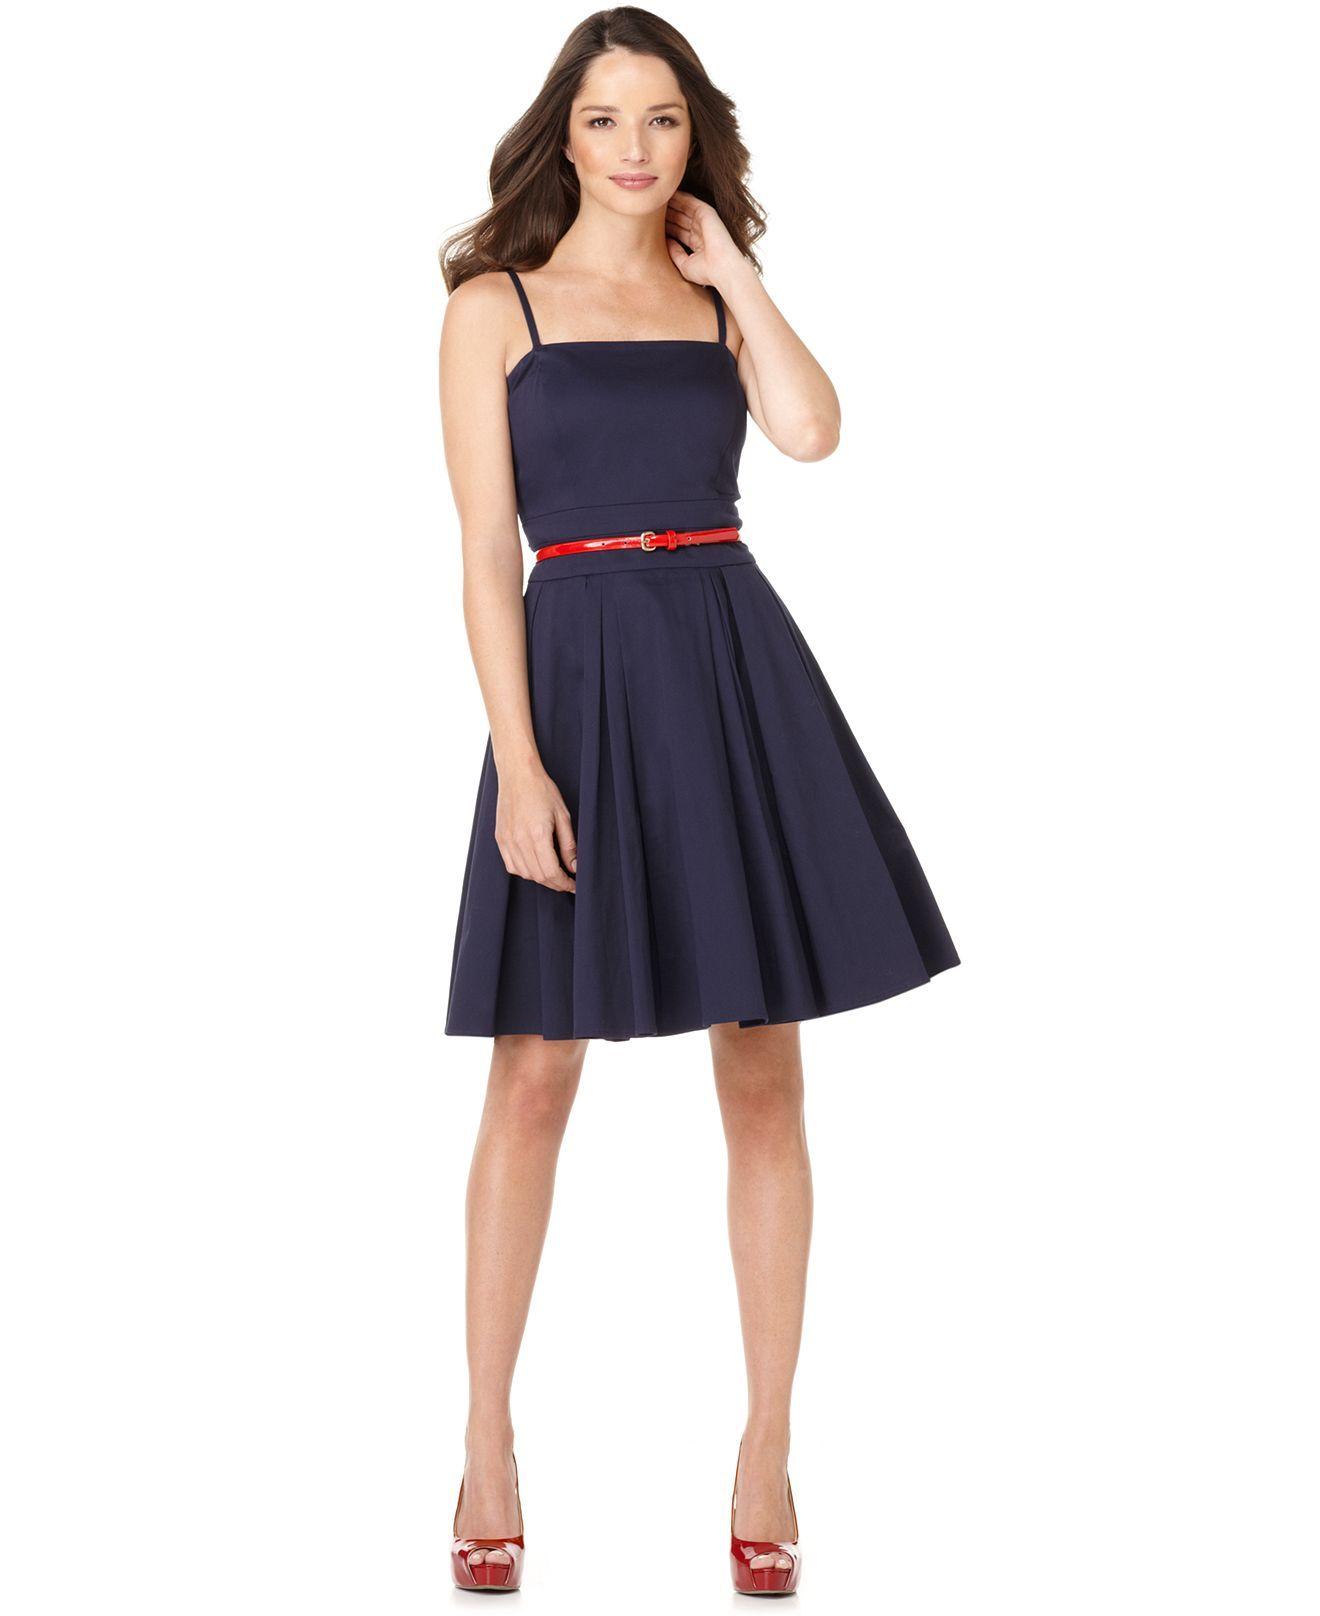 Blue Dress Red Belt Shoes Style Calvin Klein